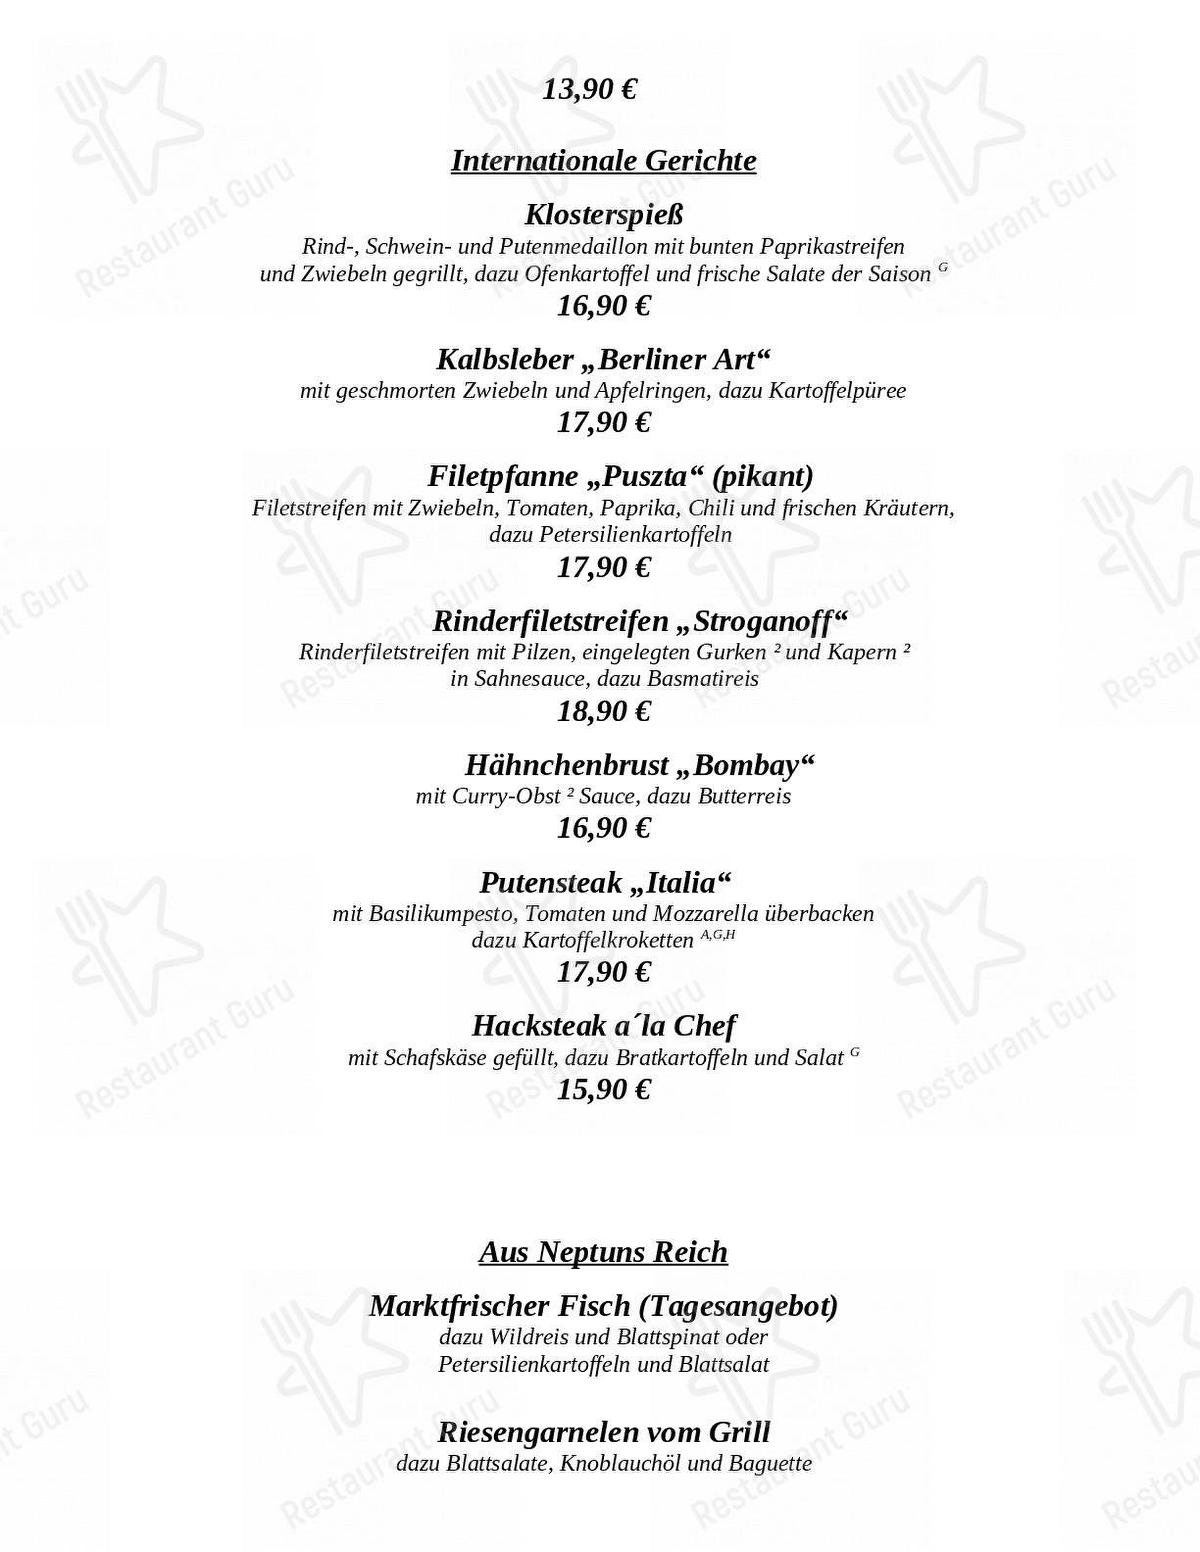 Menu for the Klosterhof restaurant